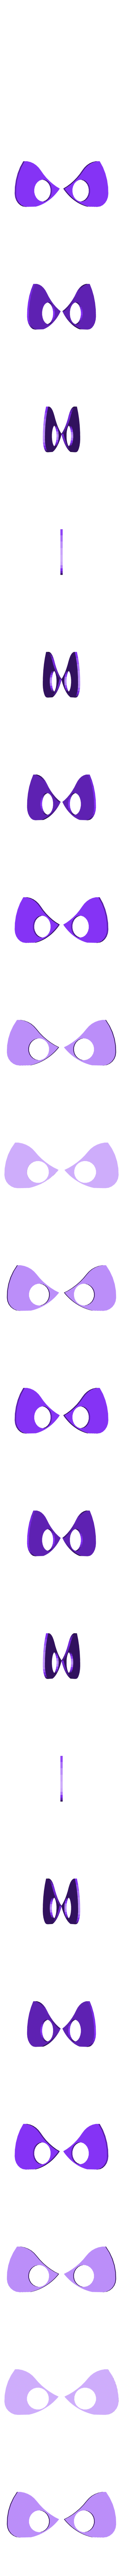 devil white by ctrl design.stl Download STL file devil emoji cam cover • 3D printable design, Byctrldesign